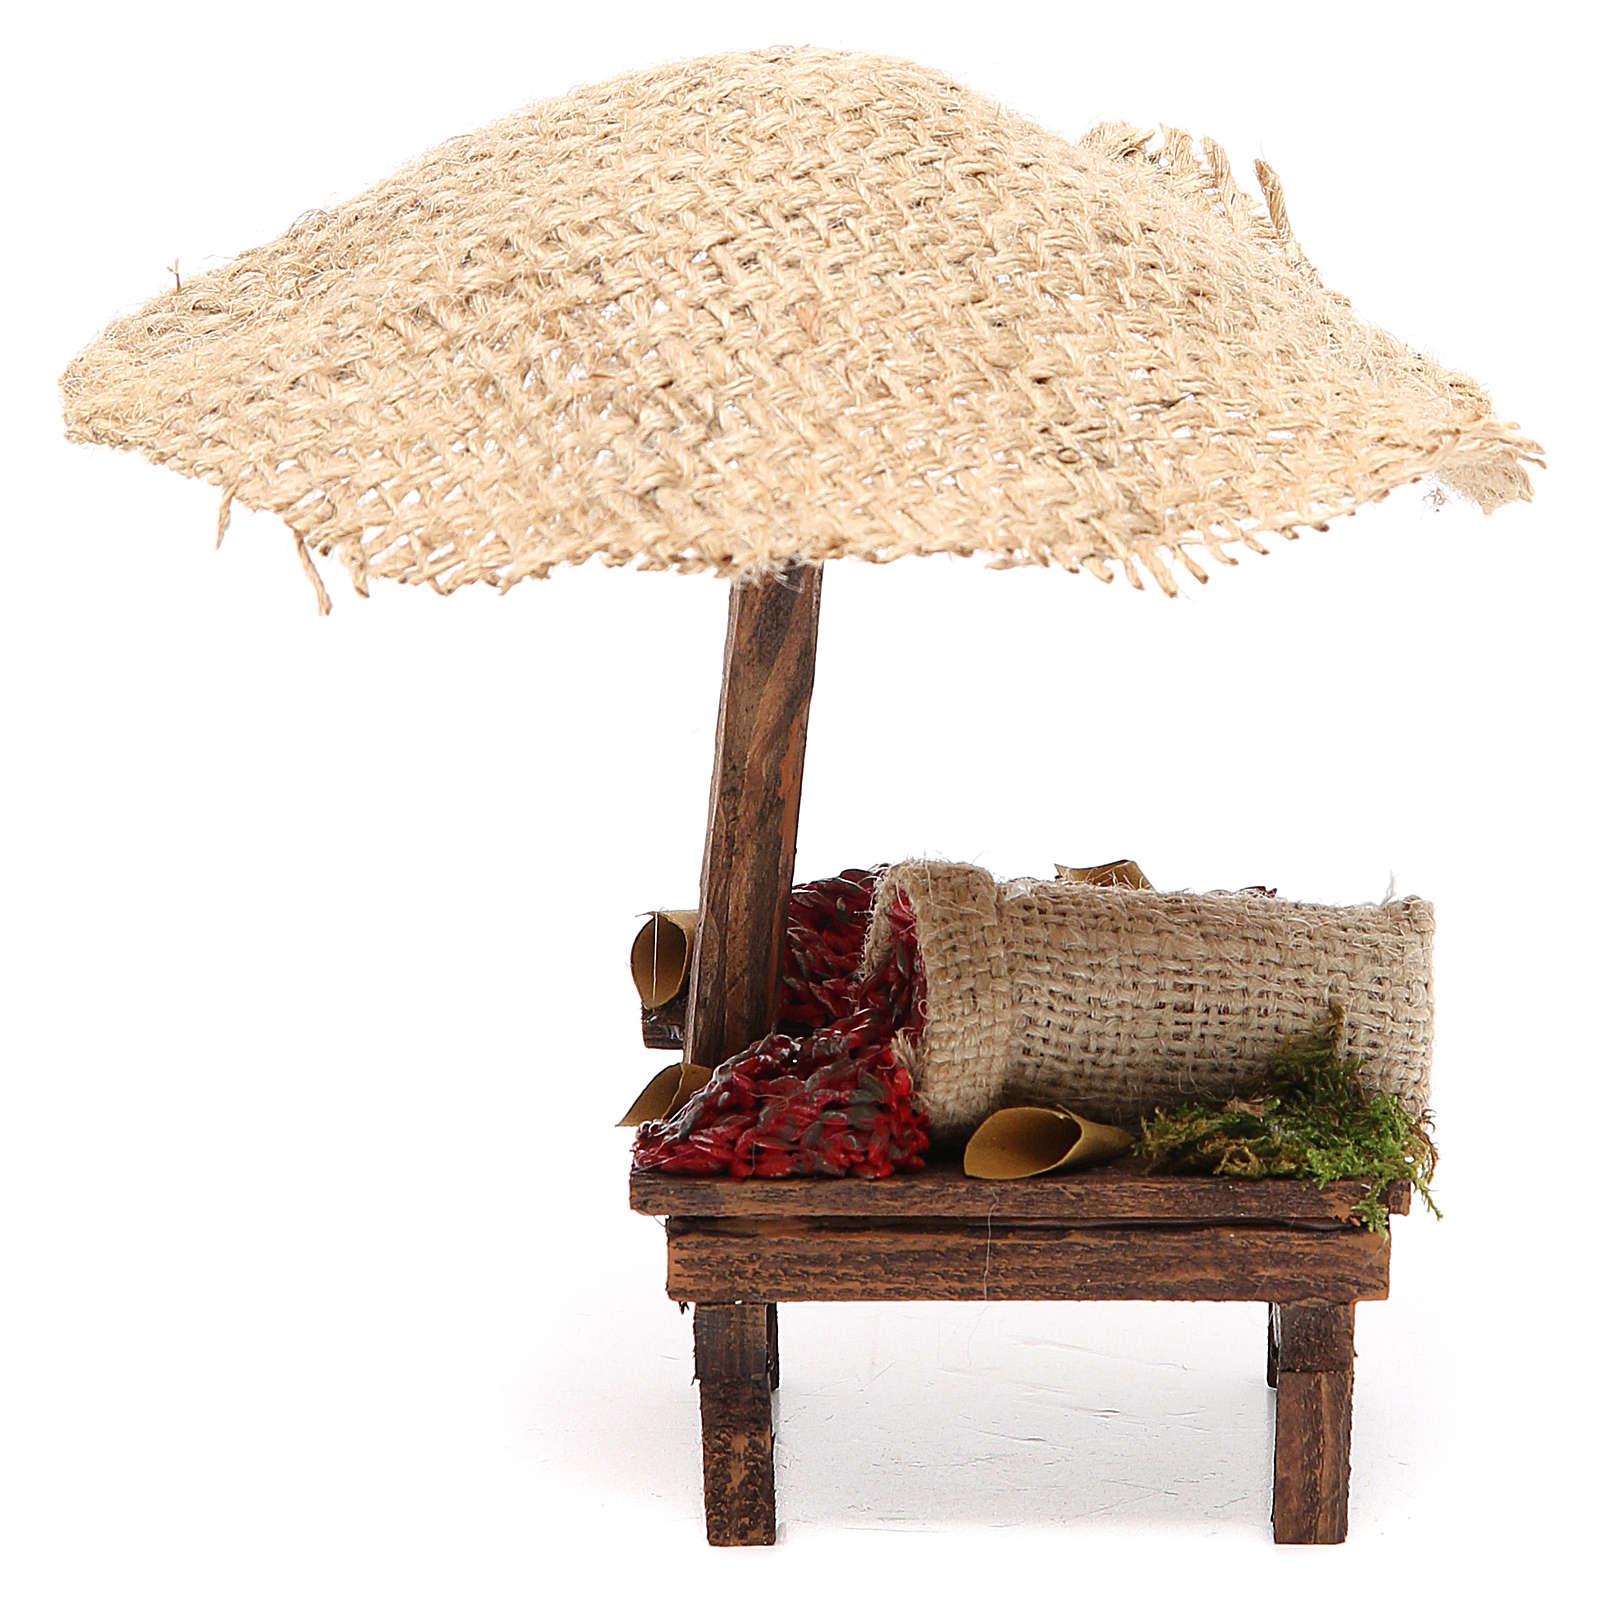 Banchetto presepe con ombrello peperoncini 16x10x12 cm 4